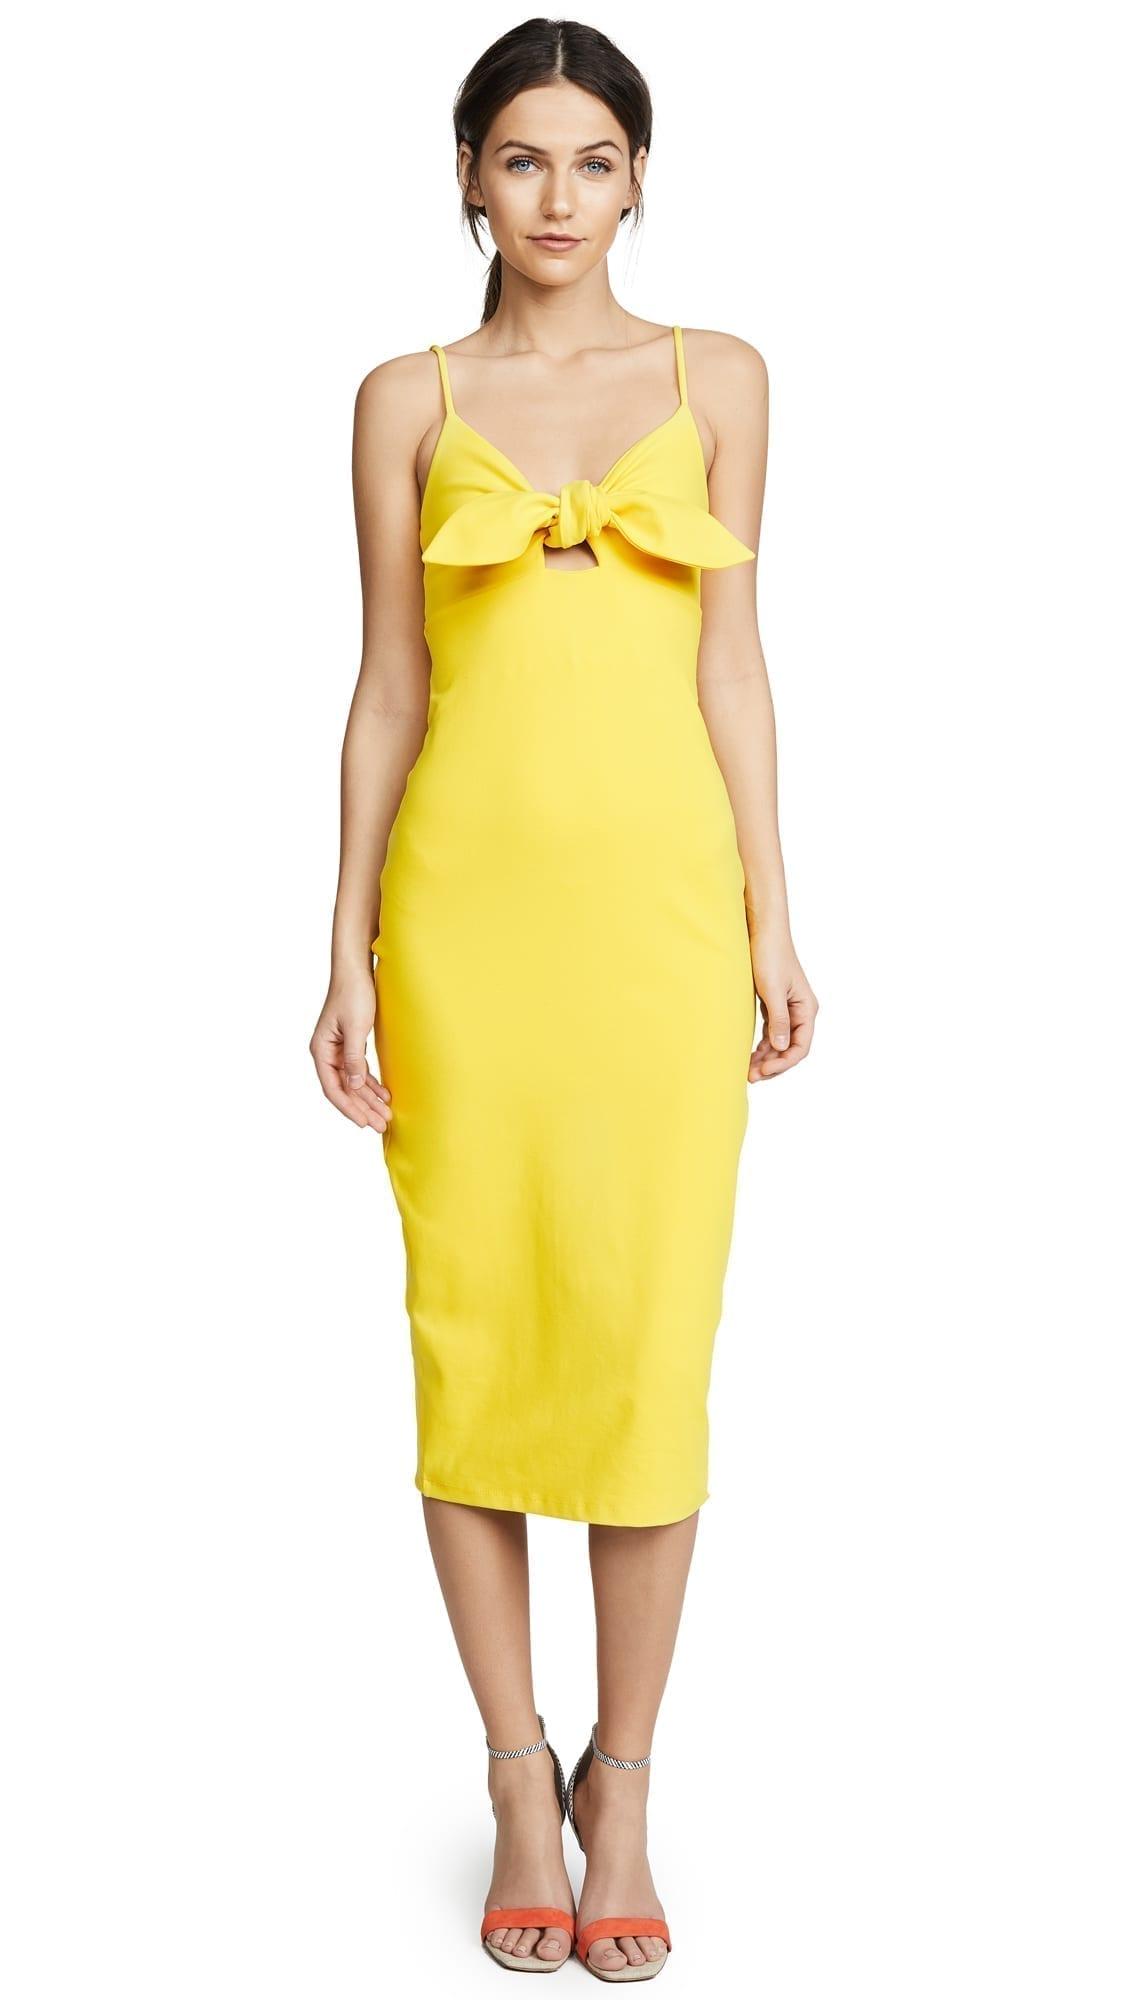 07a47dbea079 SUSANA MONACO Isadora Bow Detail Midi Limonata Dress - We Select Dresses